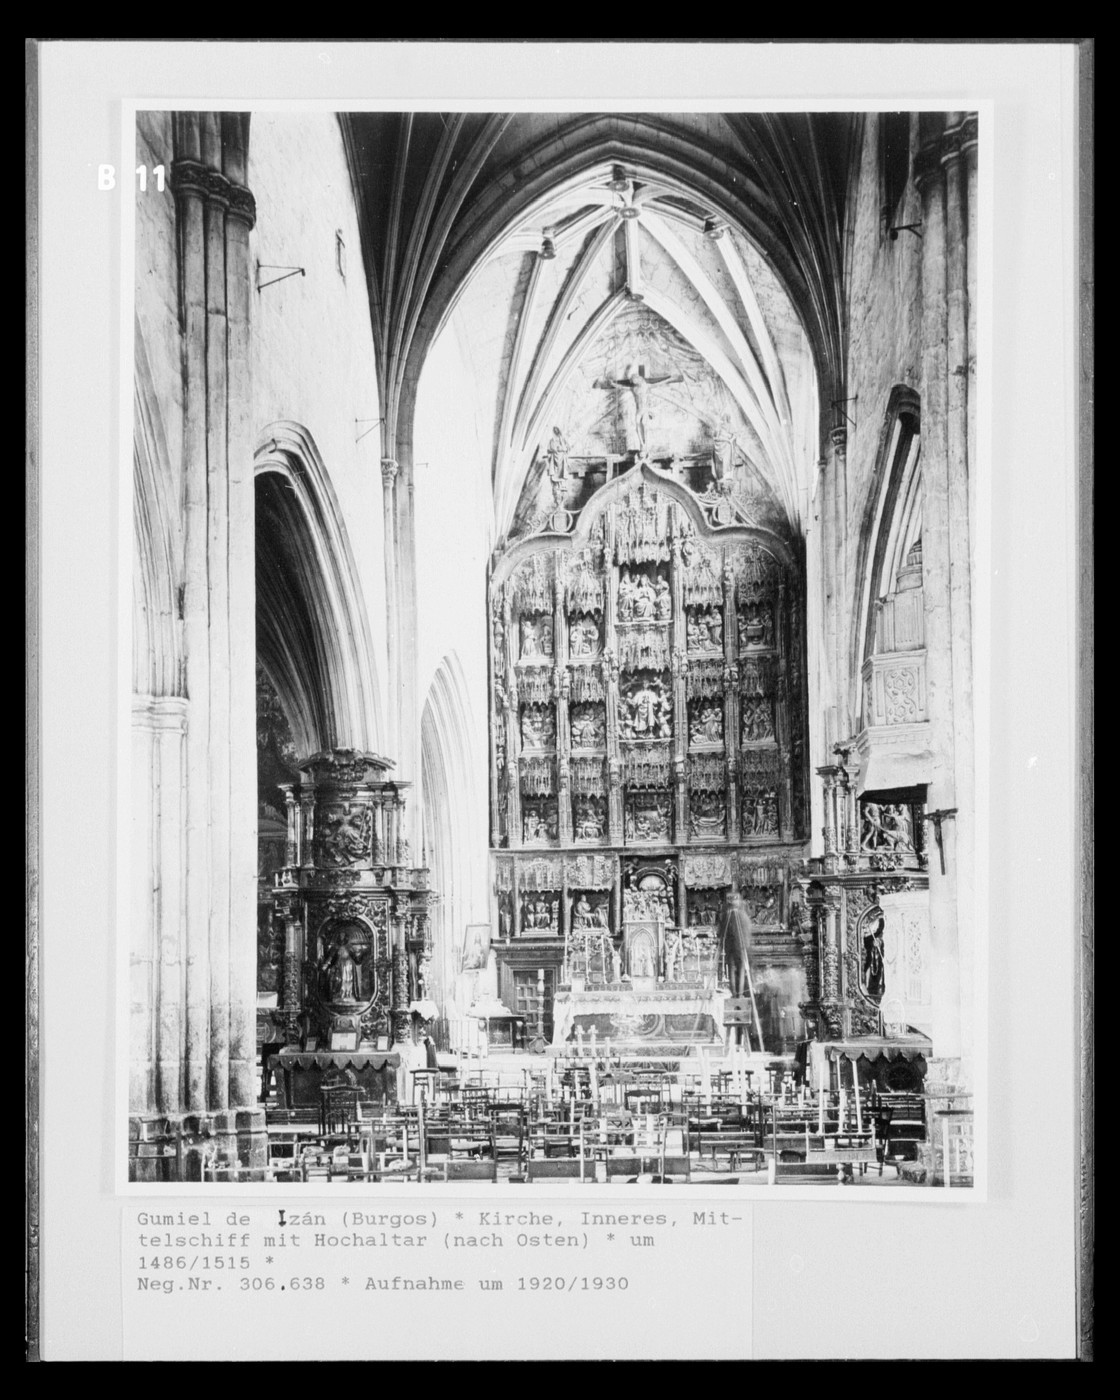 1-GumielIzAޡn 1925c Marburg 02-007